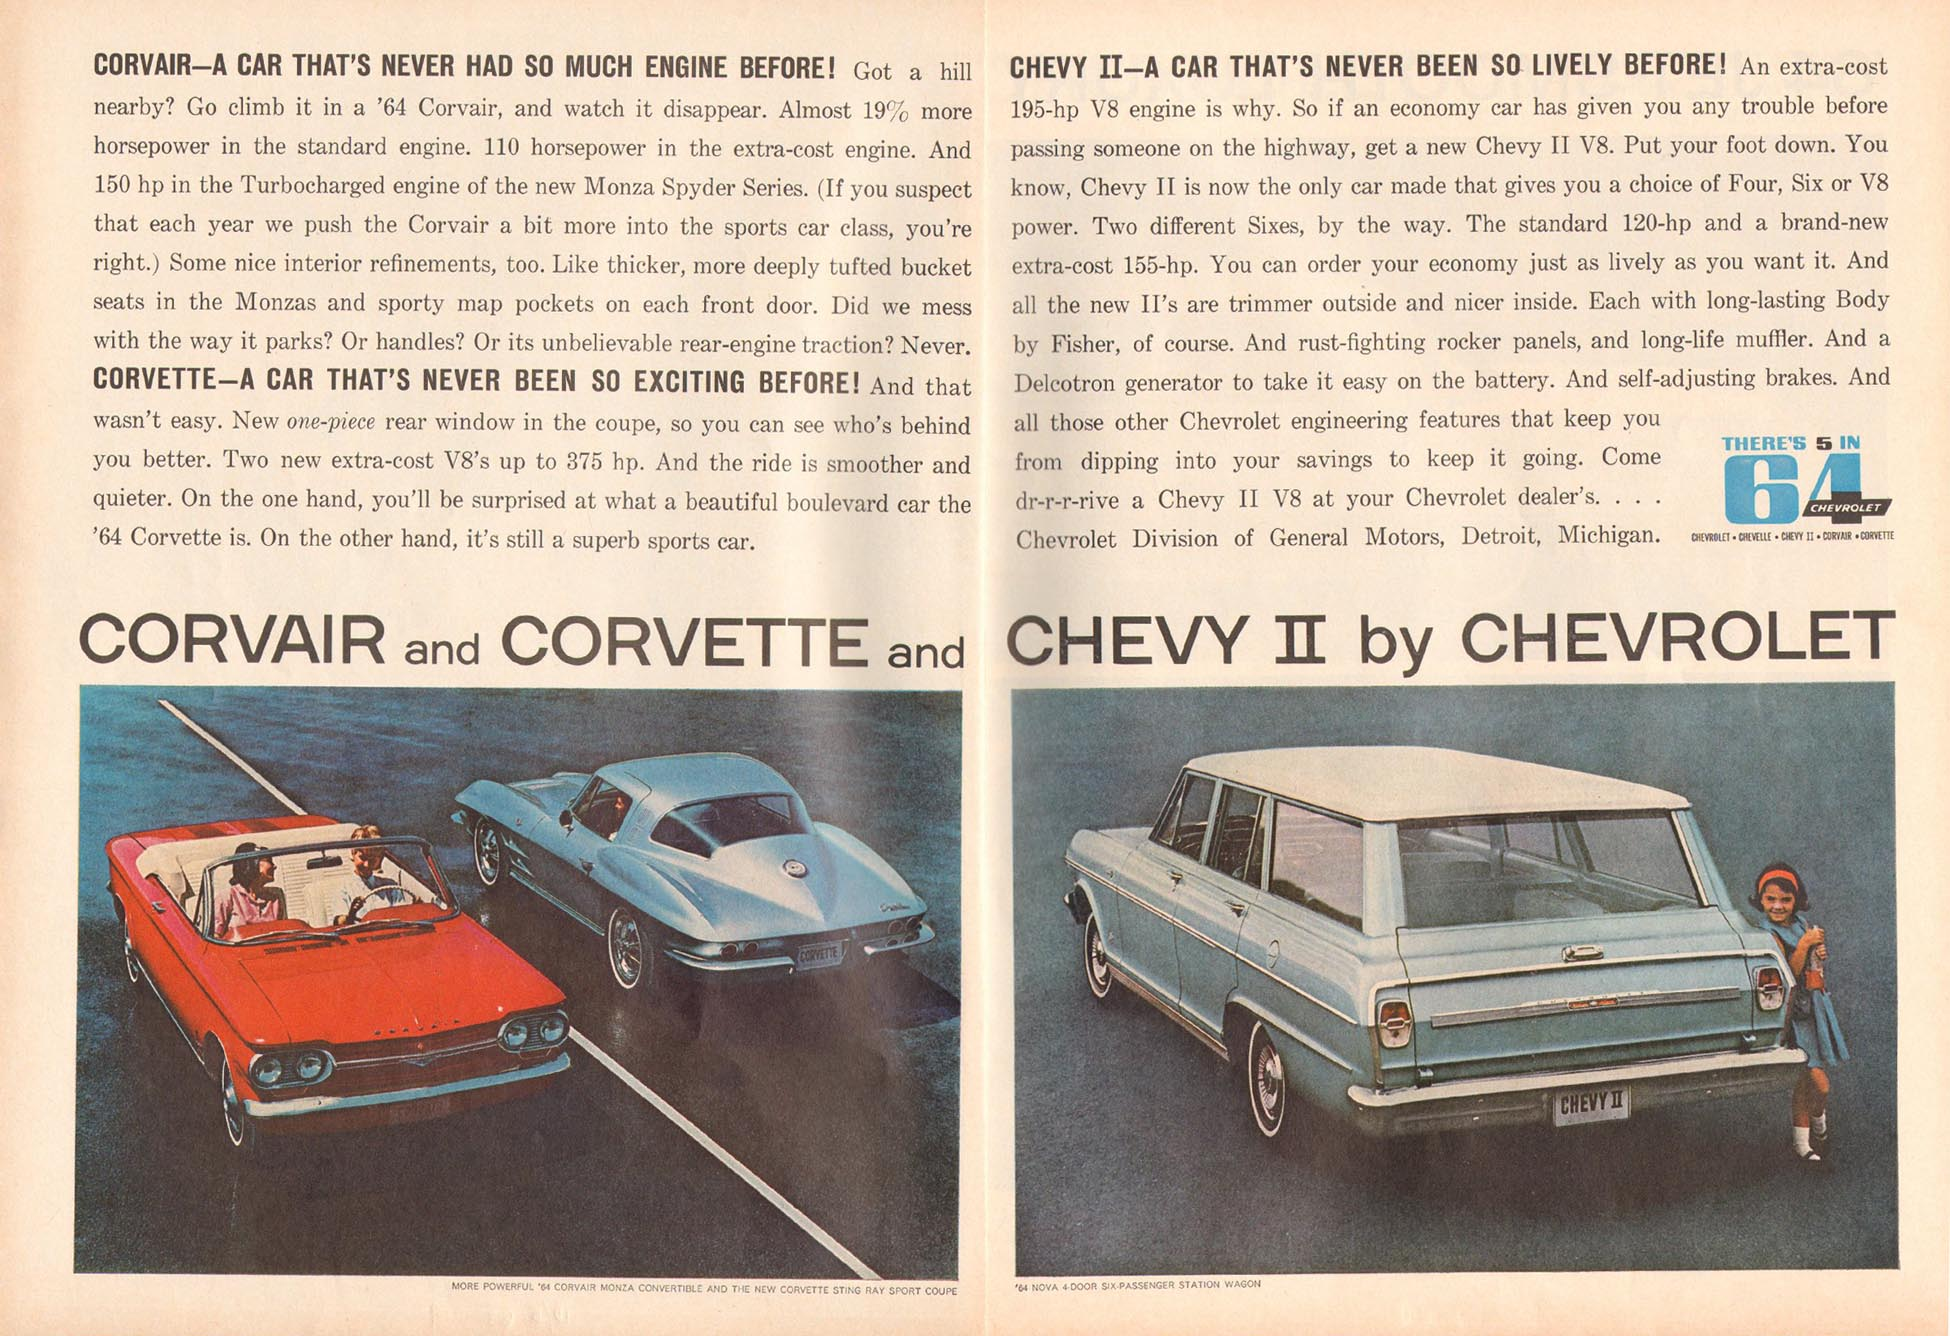 CHEVROLET AUTOMOBILES TIME 10/04/1963